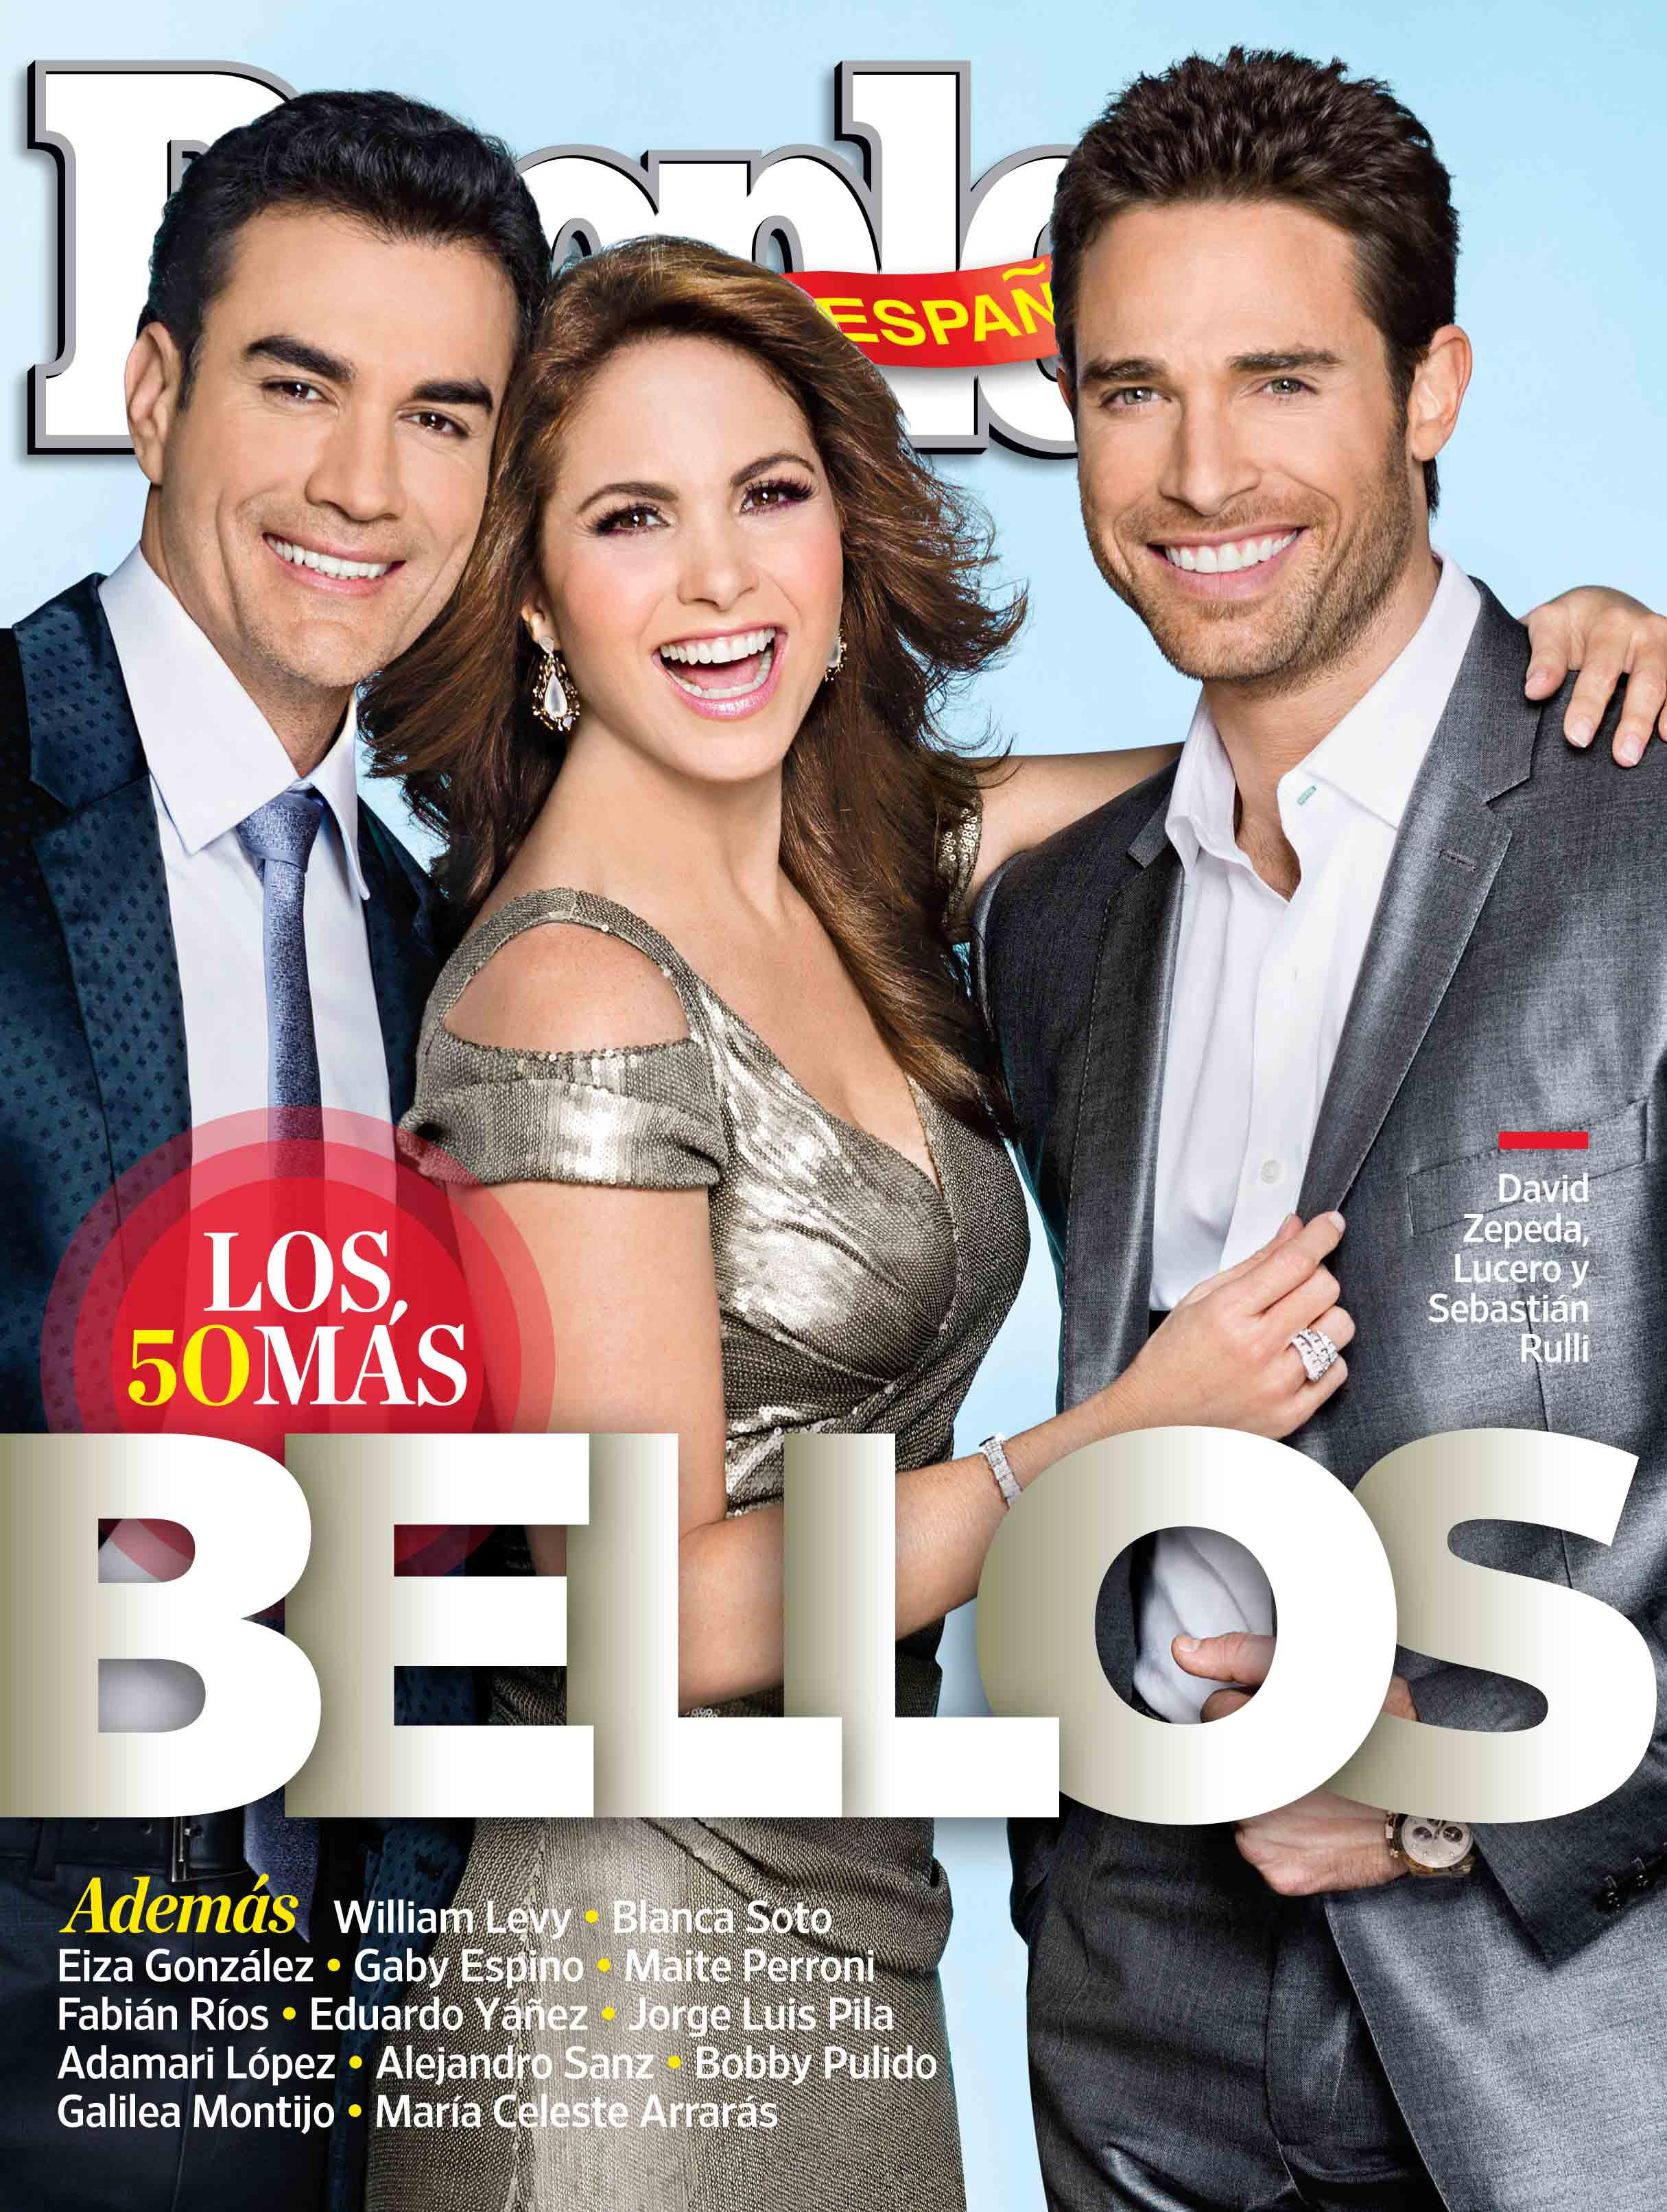 BELLOS COVER.jpg